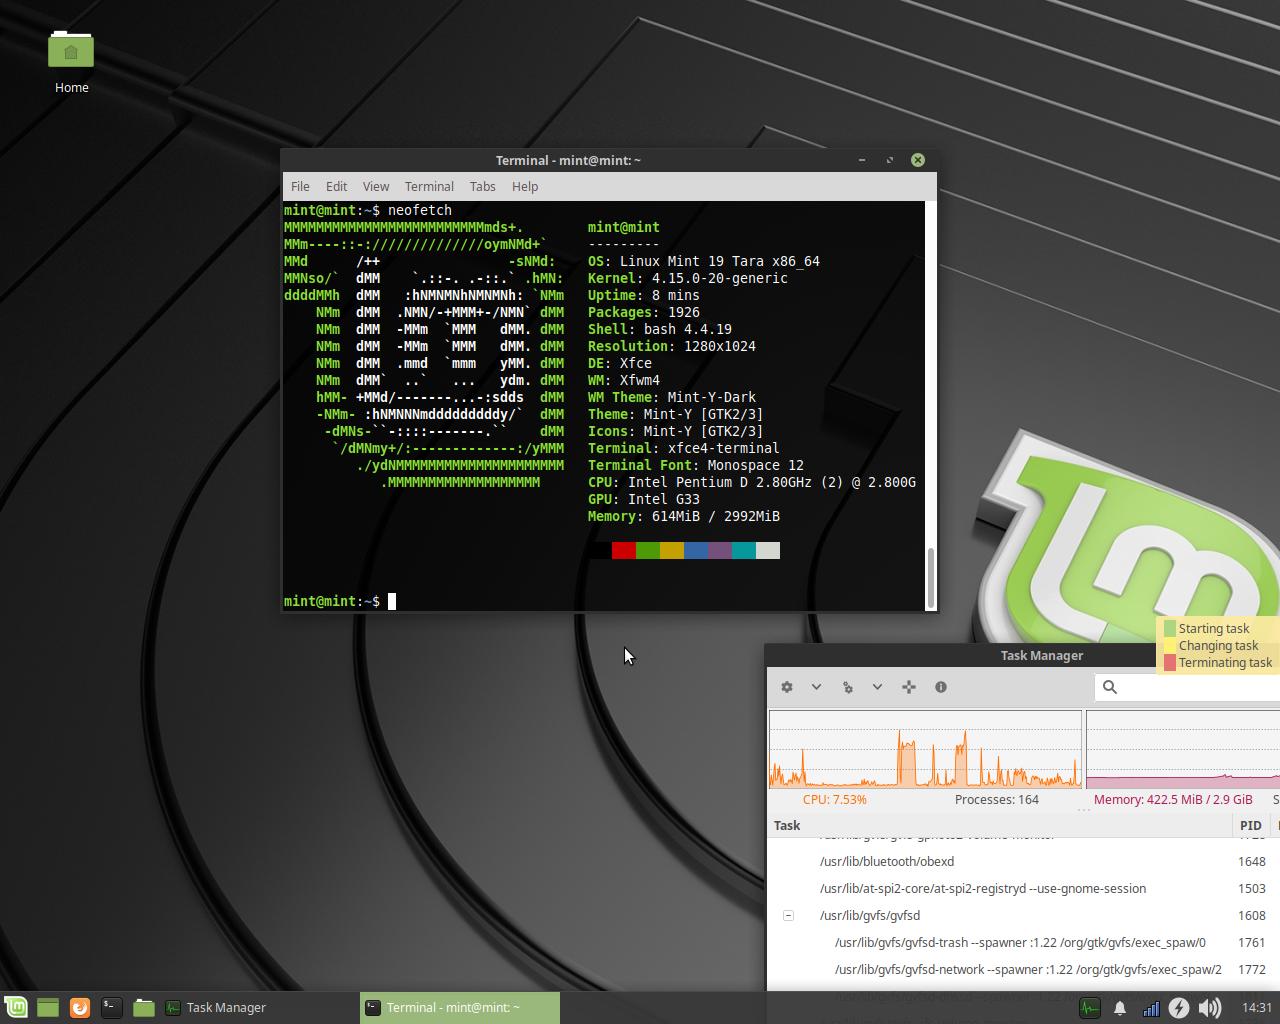 File:Linux Mint 19 -Desktopumgebung- Xfce png - Wikimedia